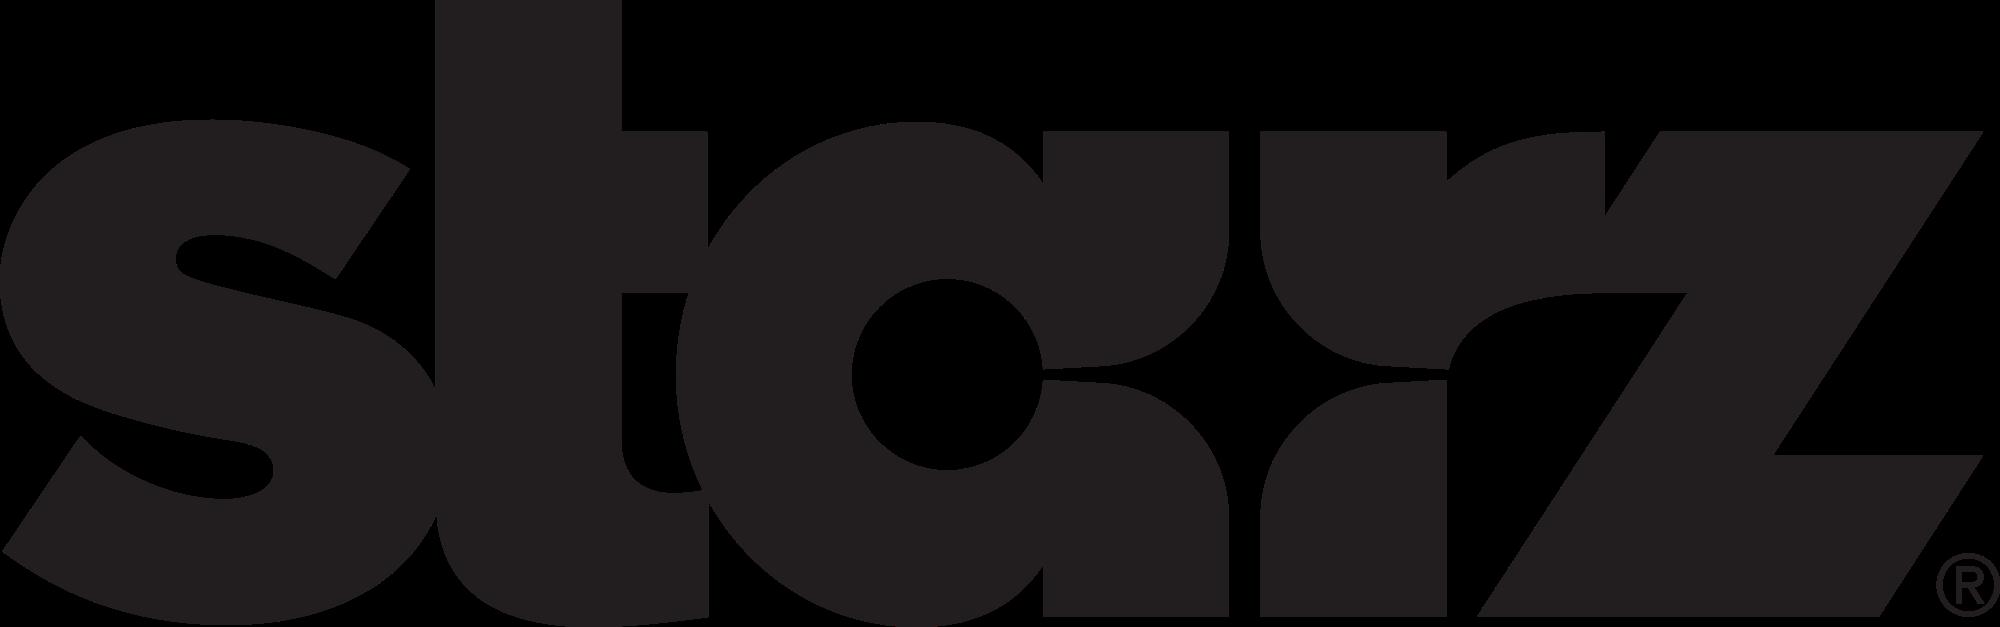 Starz_Logo_01.png